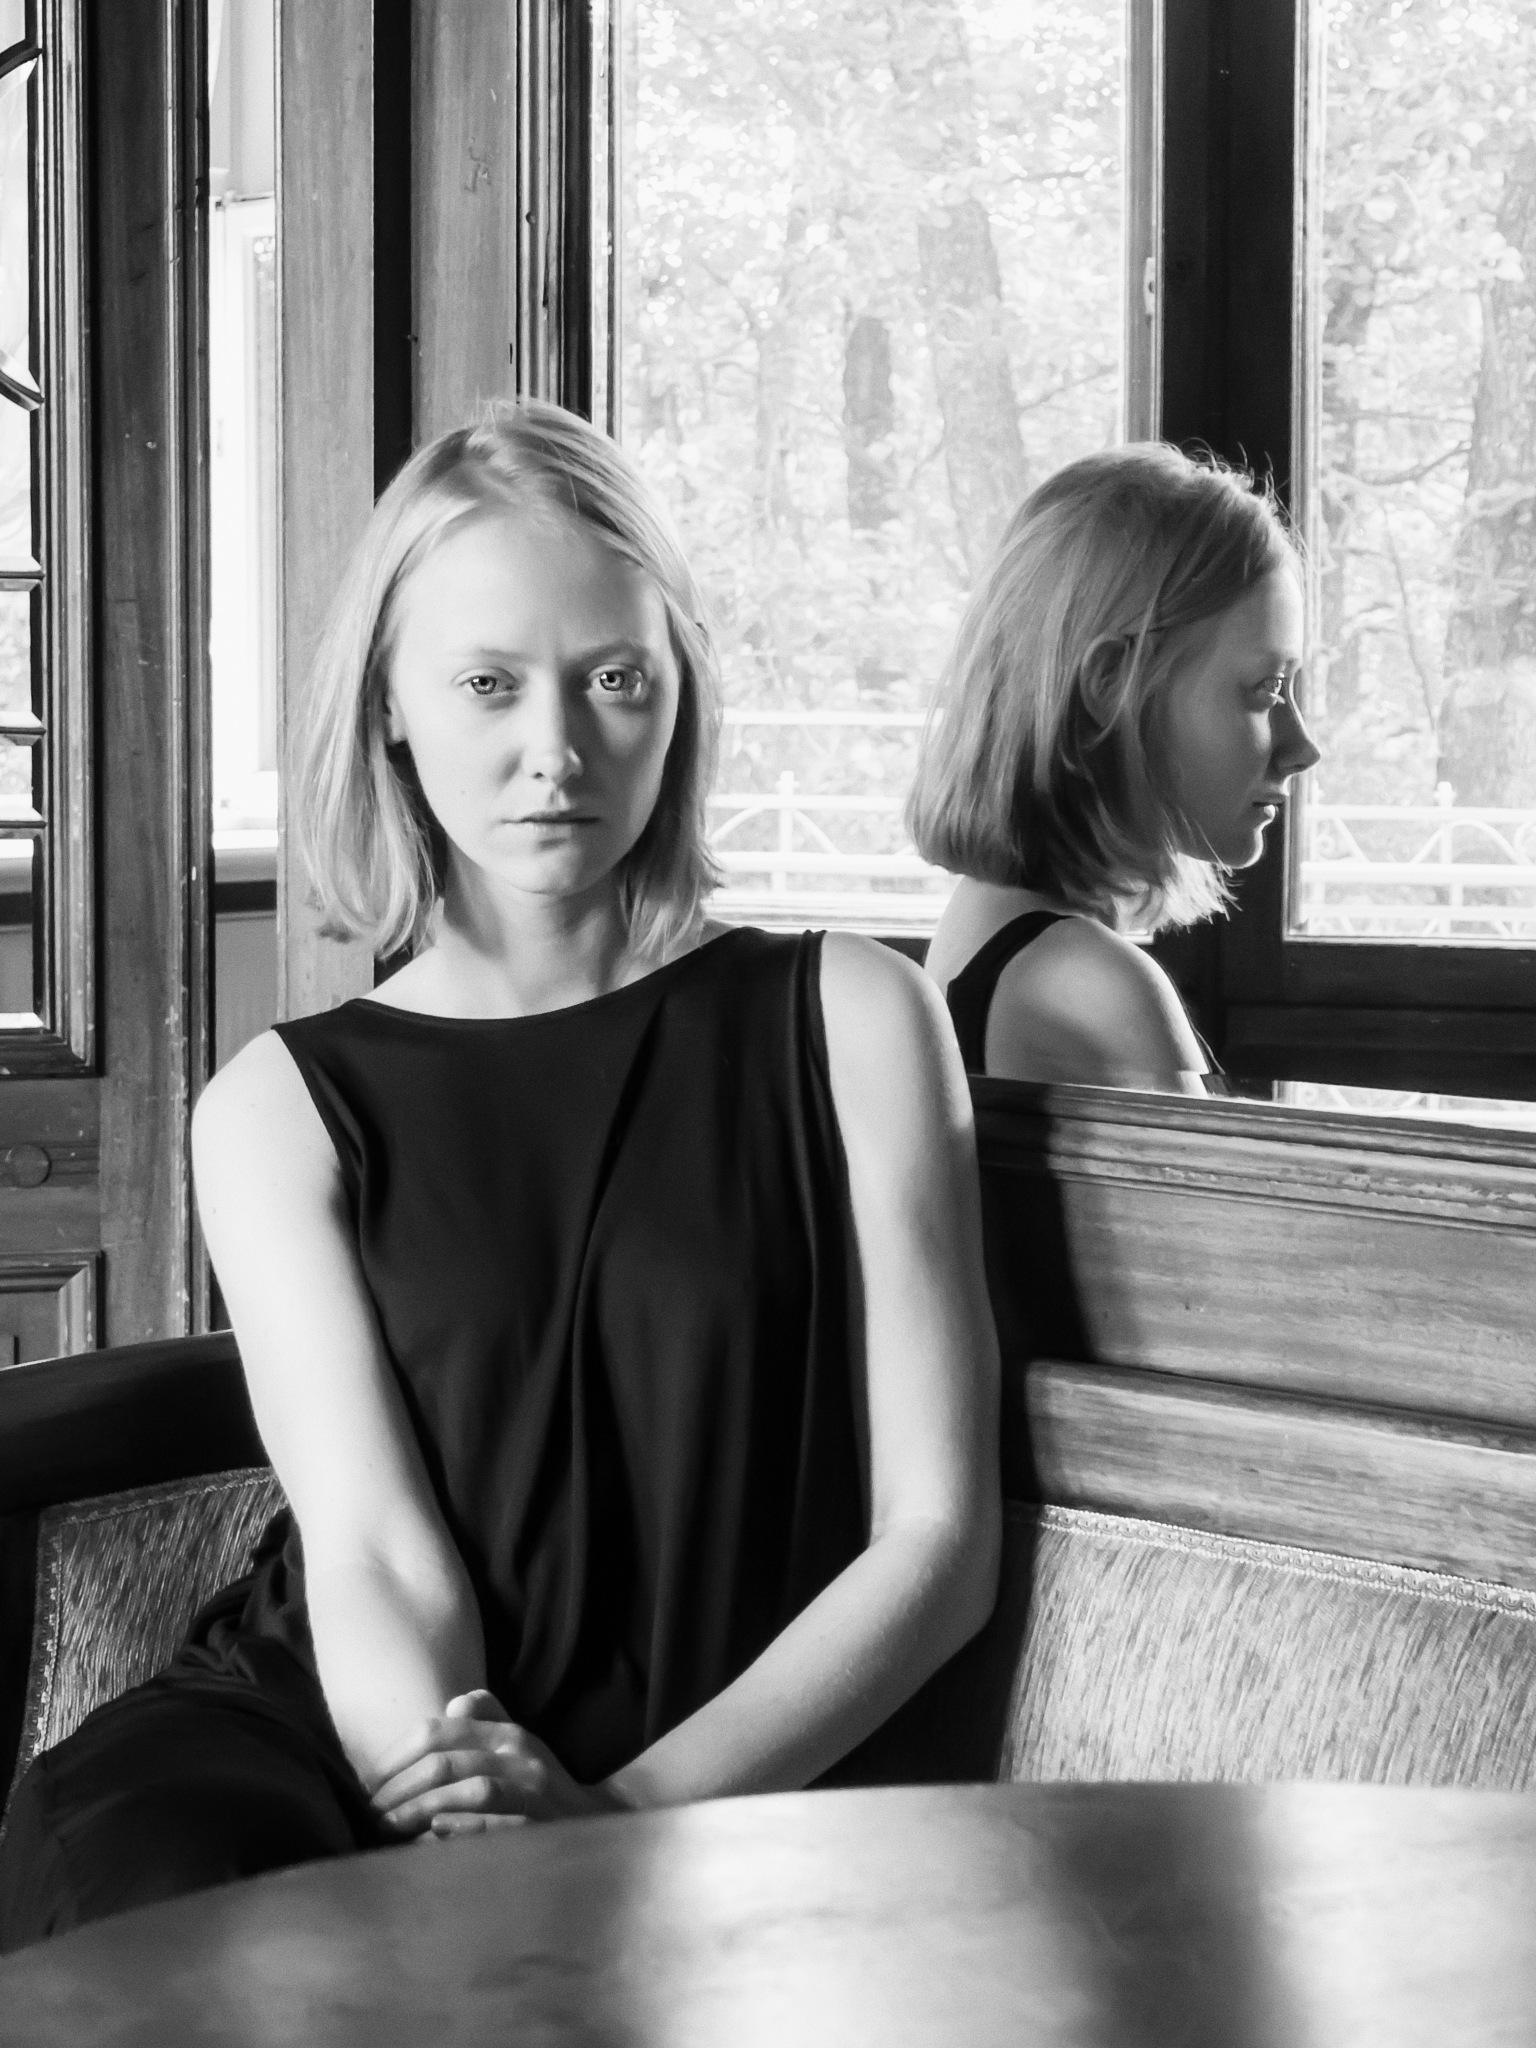 Portrait at the mirror by Tomasz Banasiak